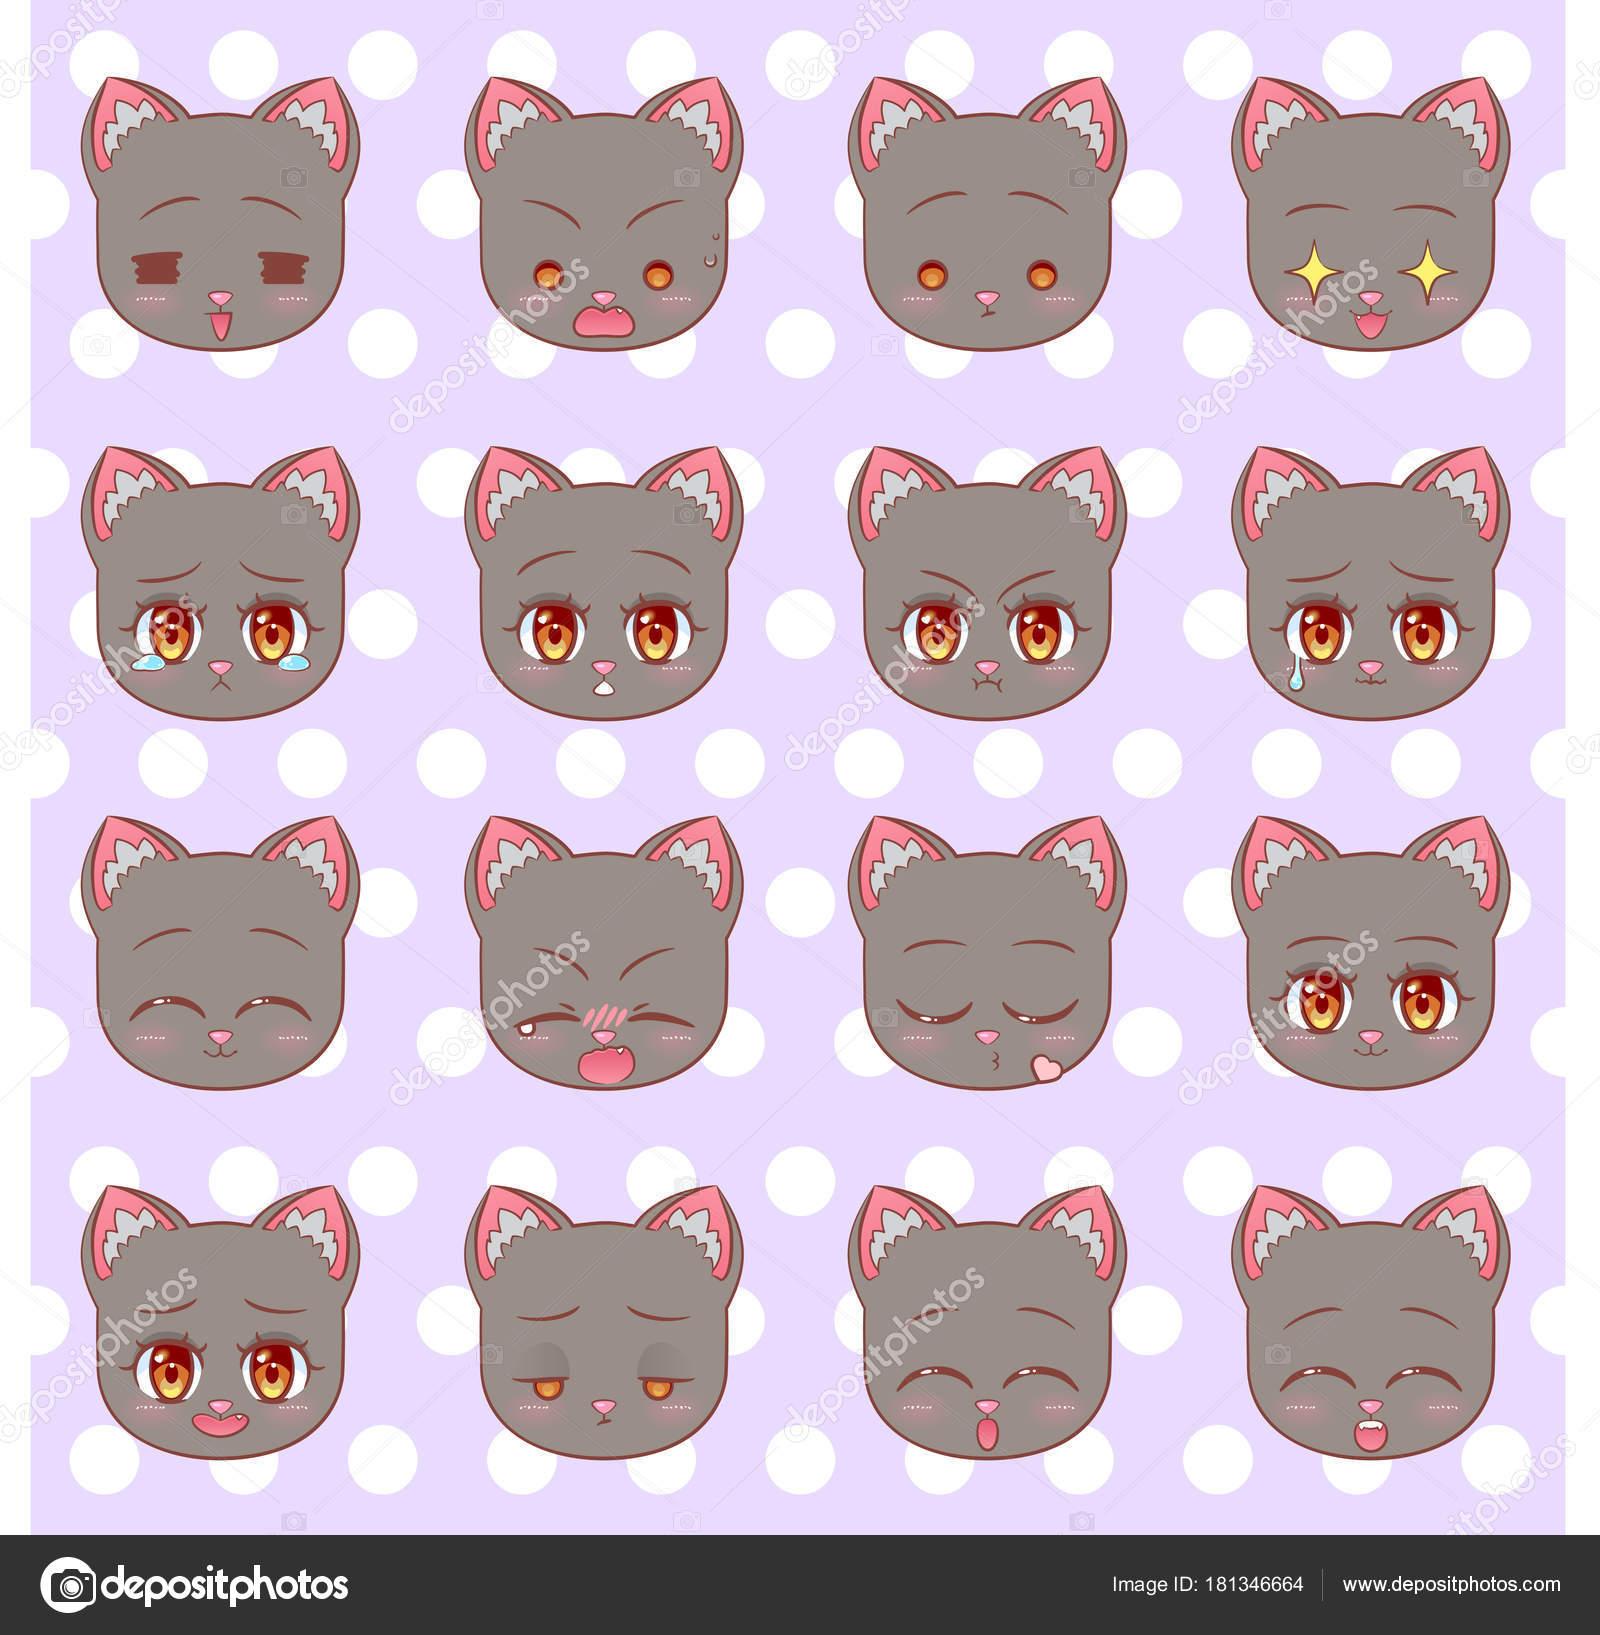 Emoticones Emoji Smiley Ensemble Colore Sweet Kitty Kawaii Cute